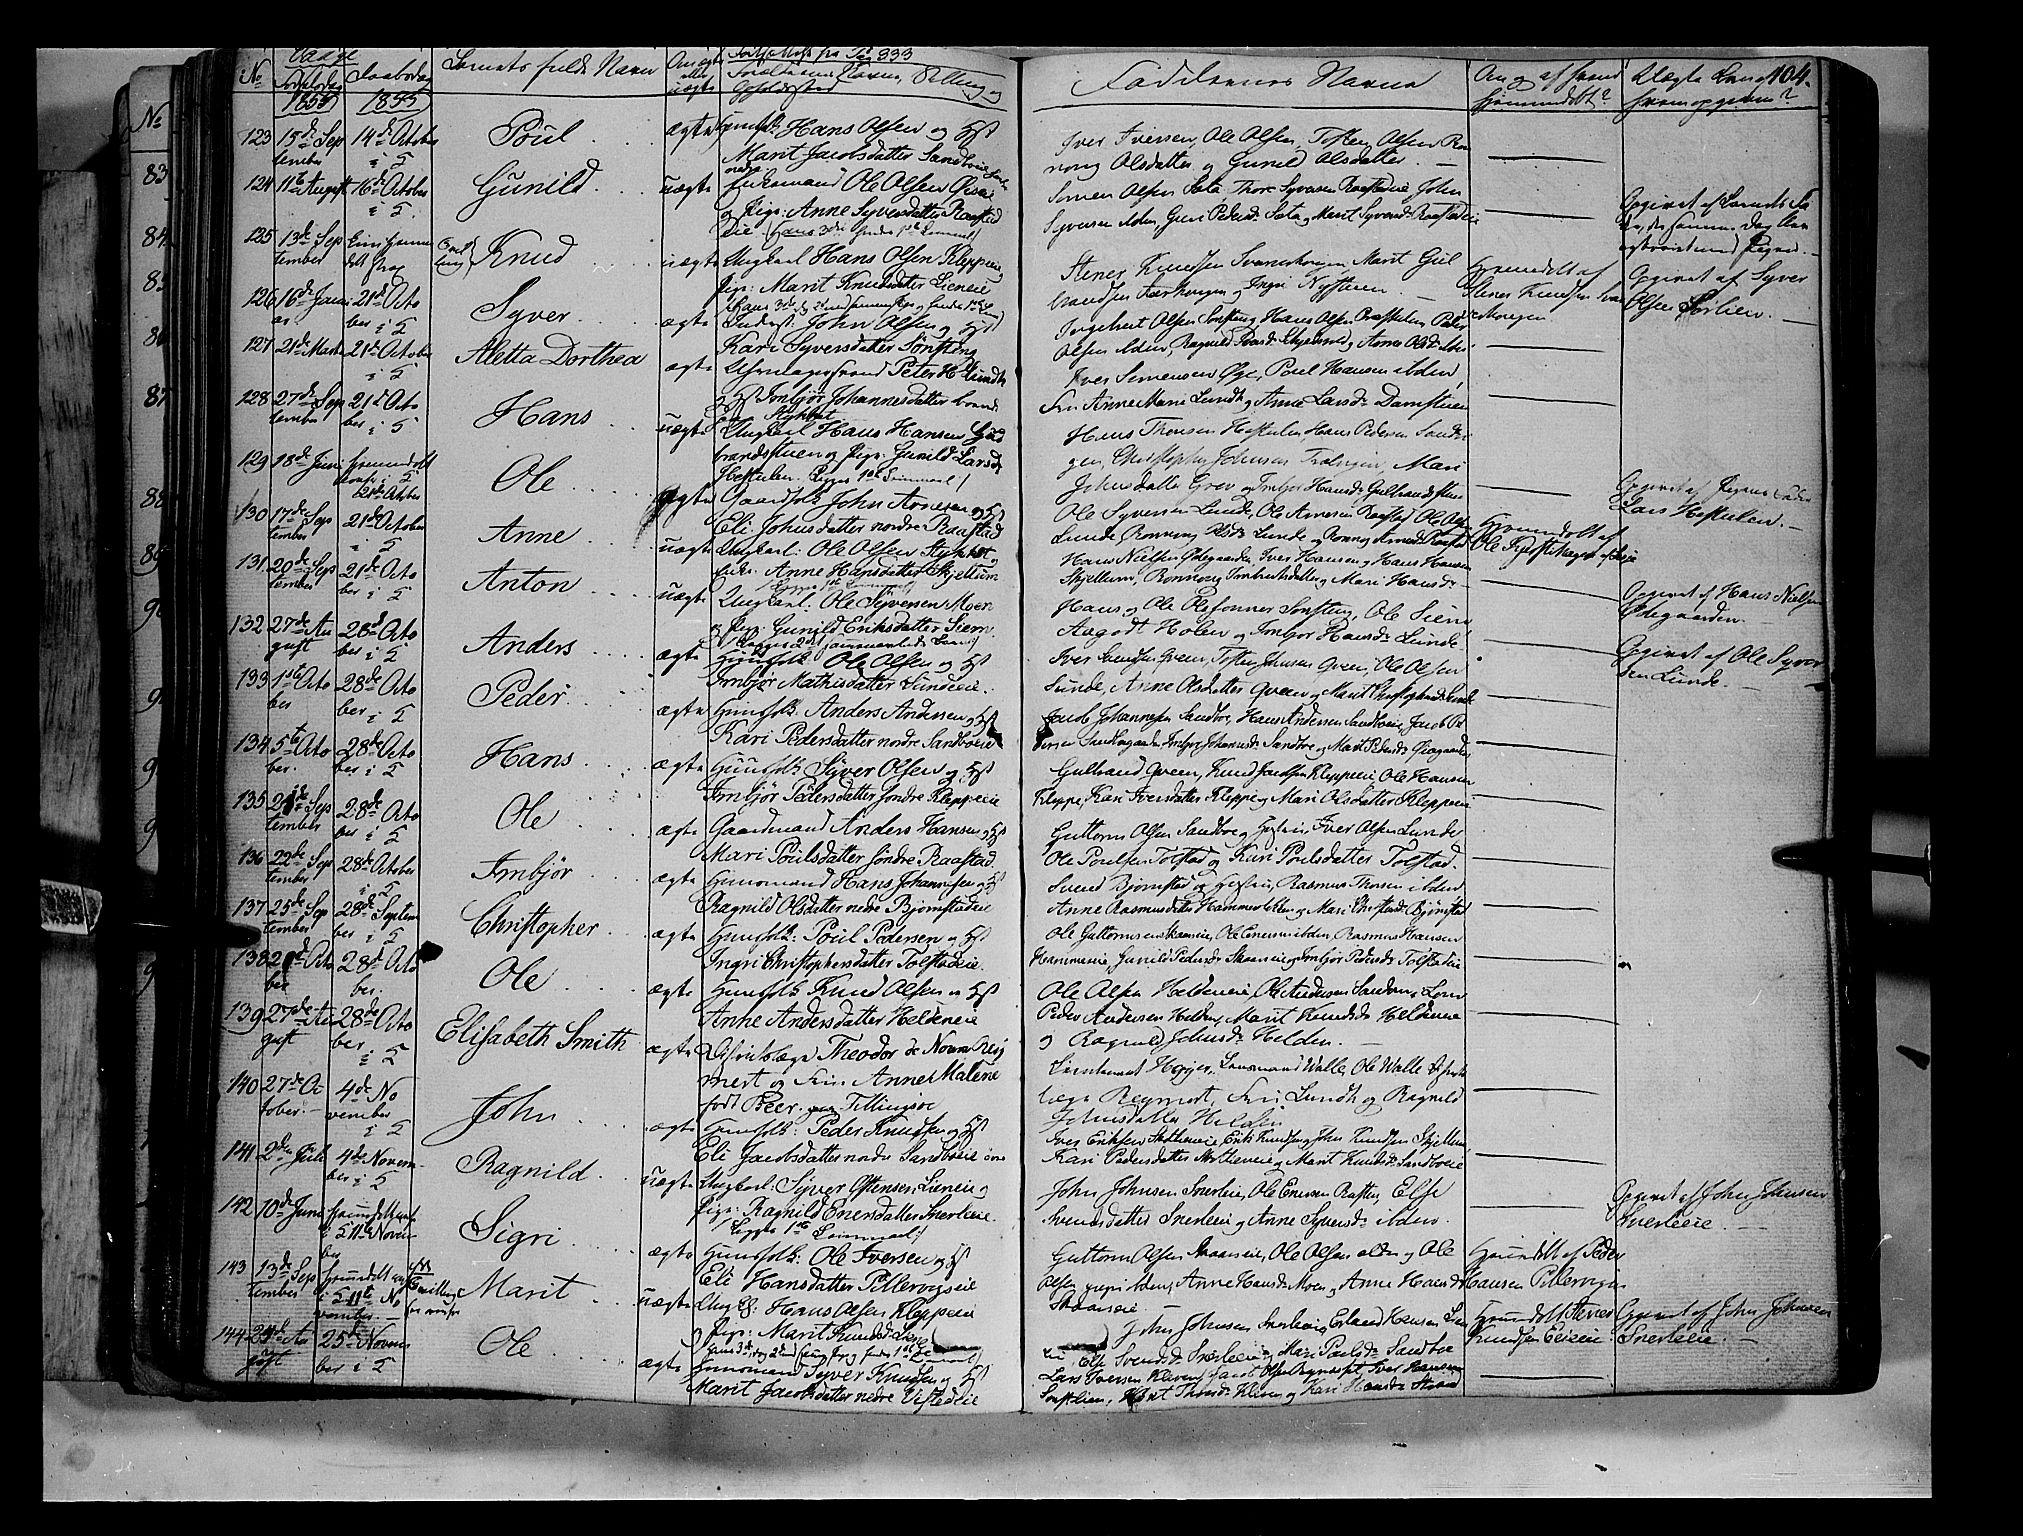 SAH, Vågå prestekontor, Ministerialbok nr. 5 /1, 1842-1856, s. 104